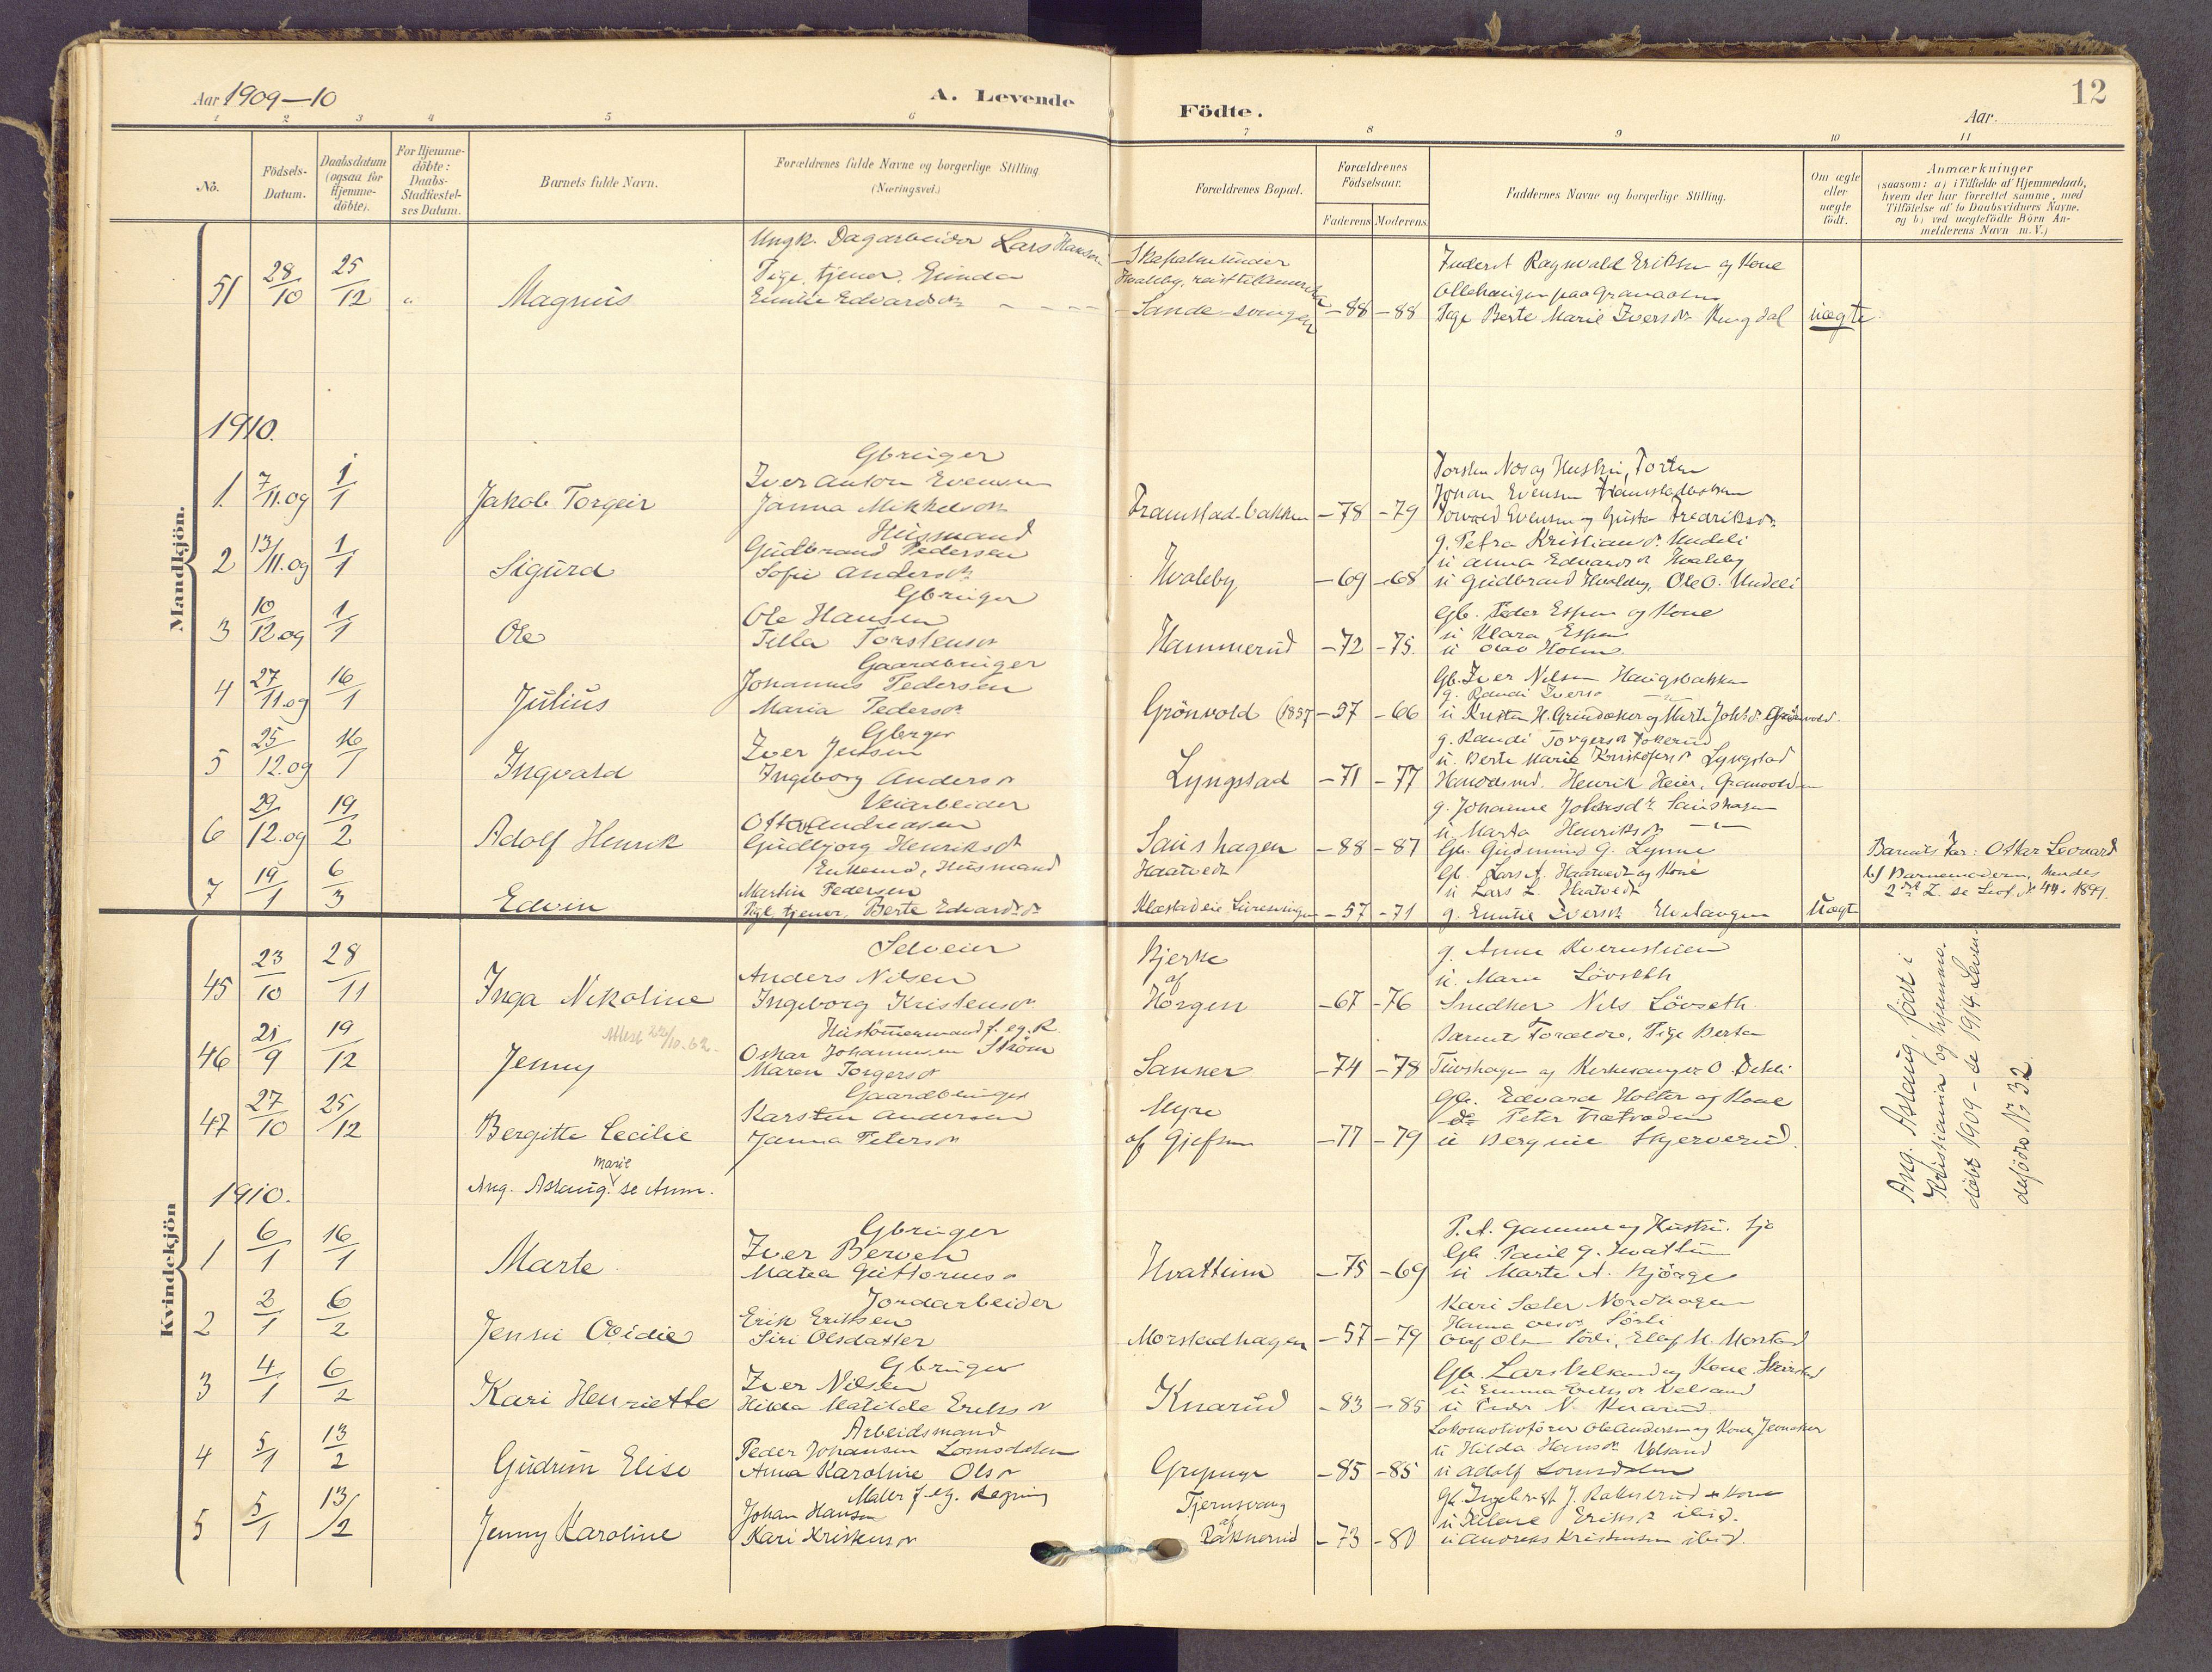 SAH, Gran prestekontor, Ministerialbok nr. 21, 1908-1932, s. 12